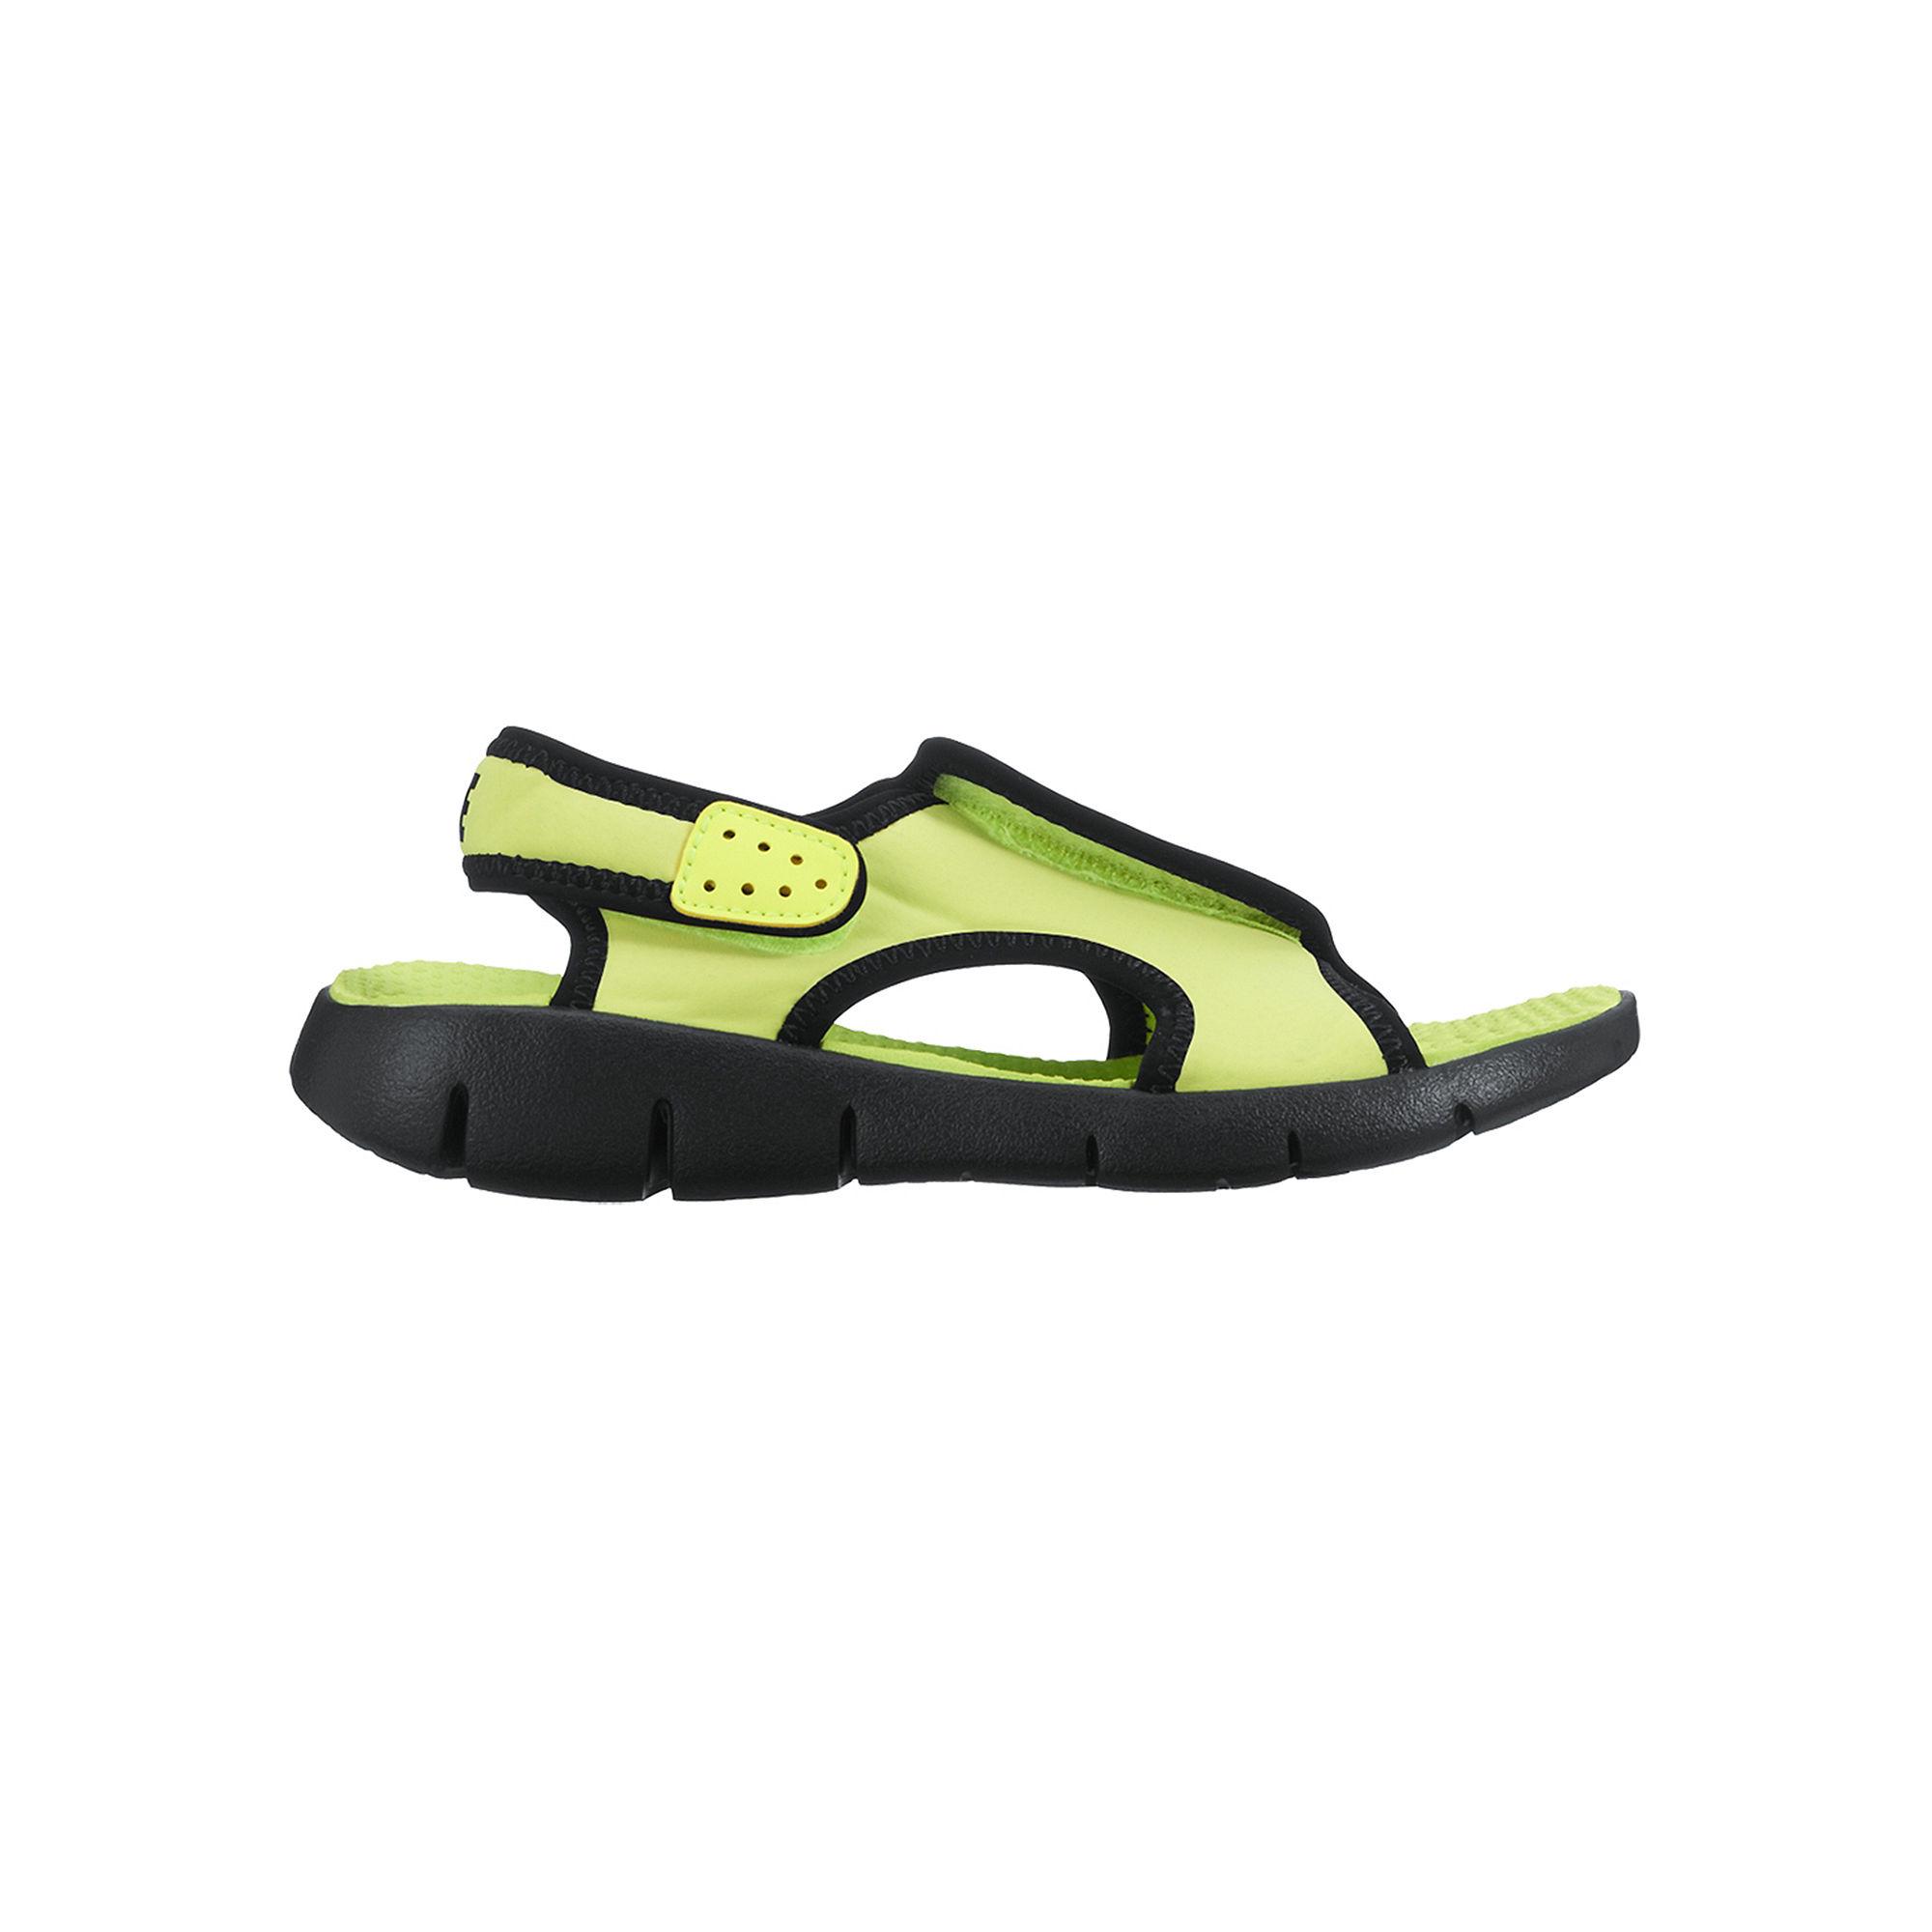 1b8b3cc502fe ... UPC 883418911348 product image for Nike Sunray Adjustable Boys Sandals  - Little Kids Big Kids ...